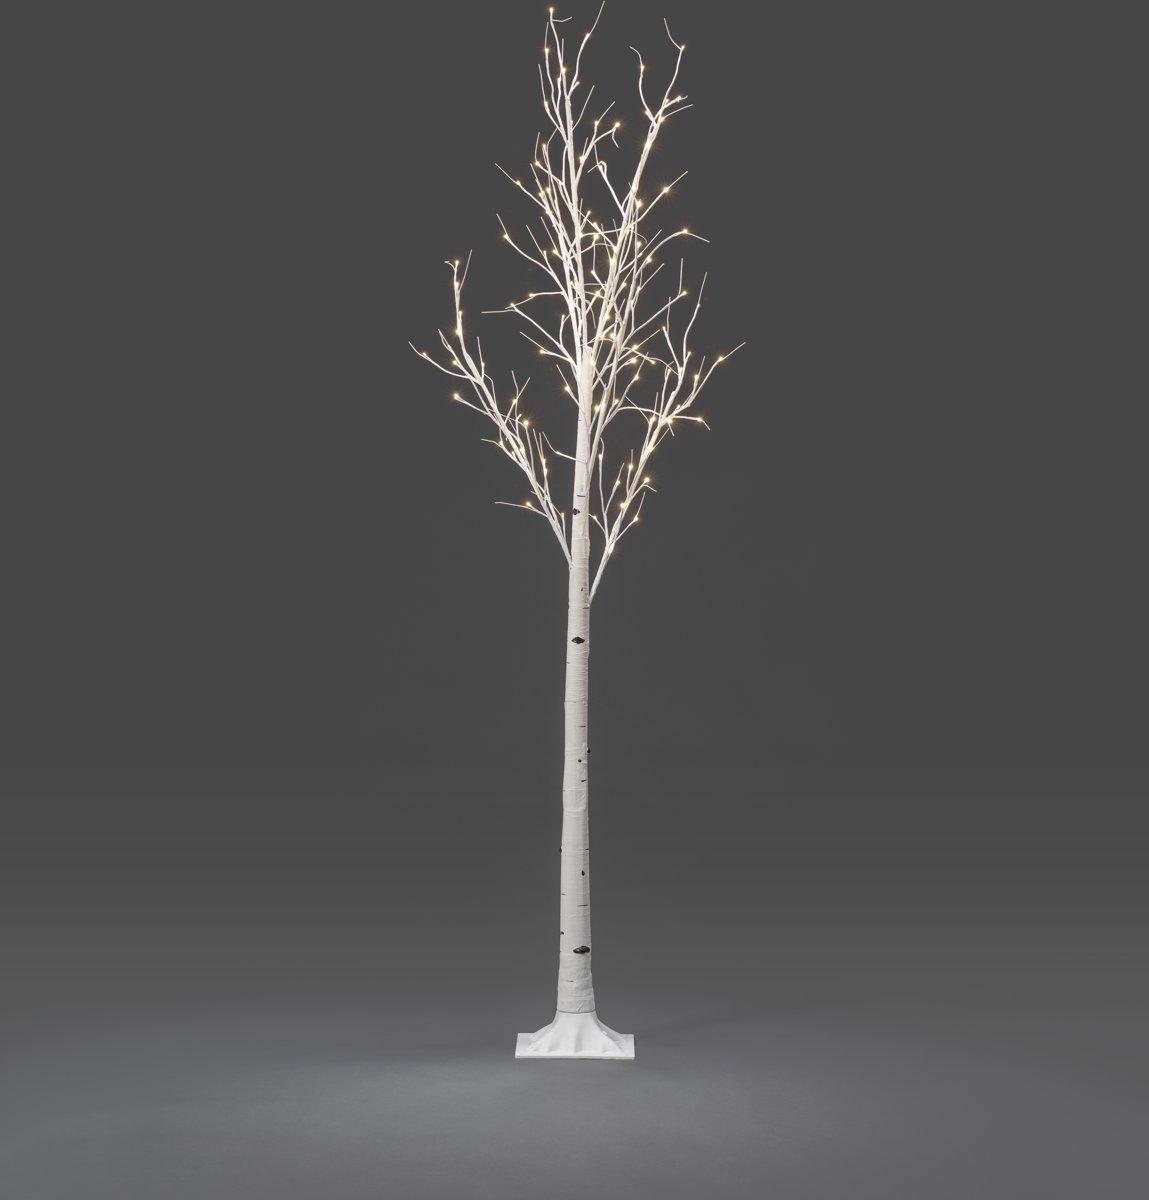 Konstsmide - LED berk op voet 240cm 24V 120x - warmwit kopen